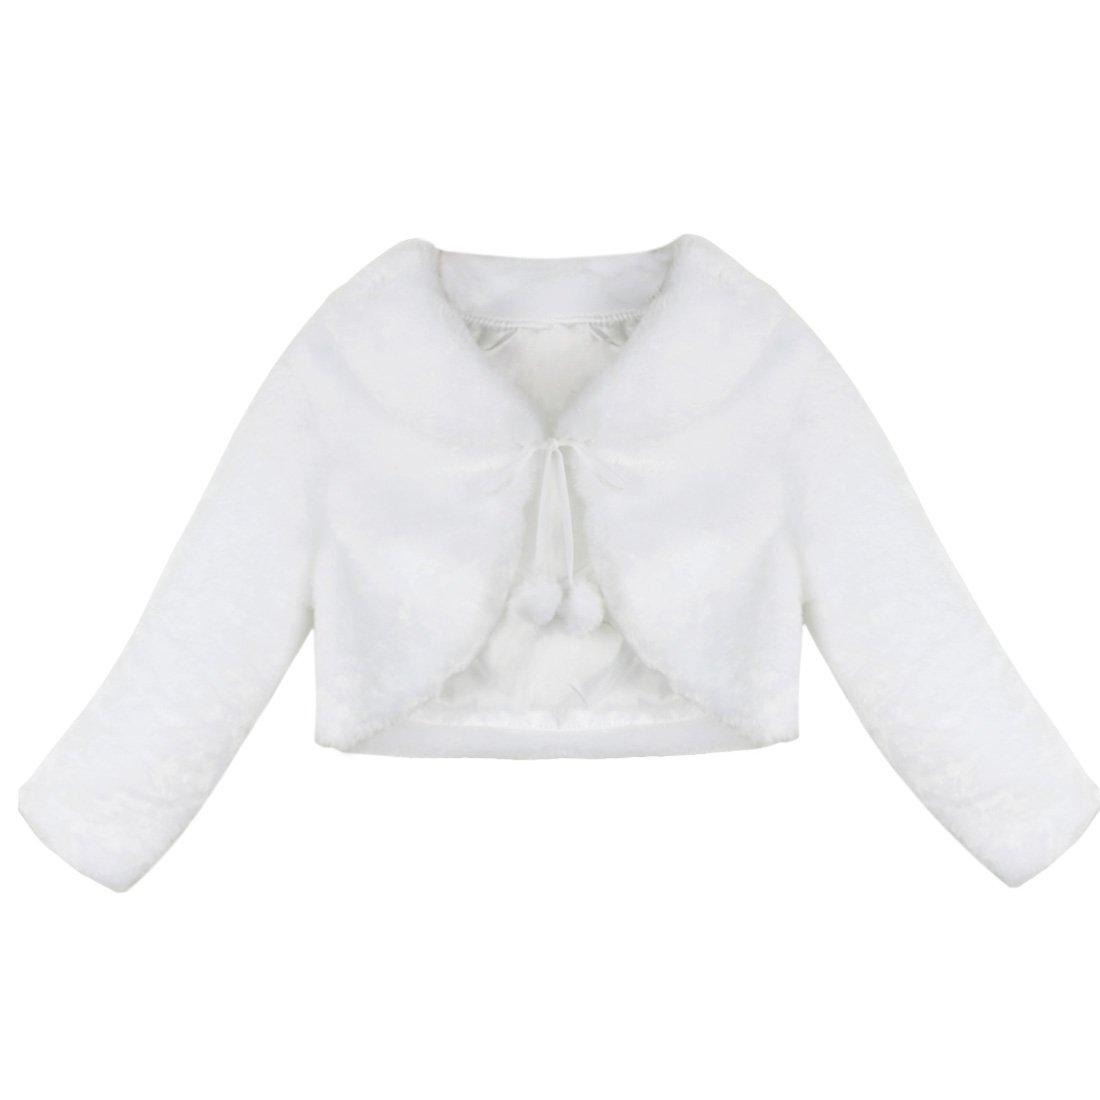 iEFiEL Girls Baptism Flower Dress Wedding Faux Fur Bolero Jacket Shrug Ivory 7-8 by iEFiEL